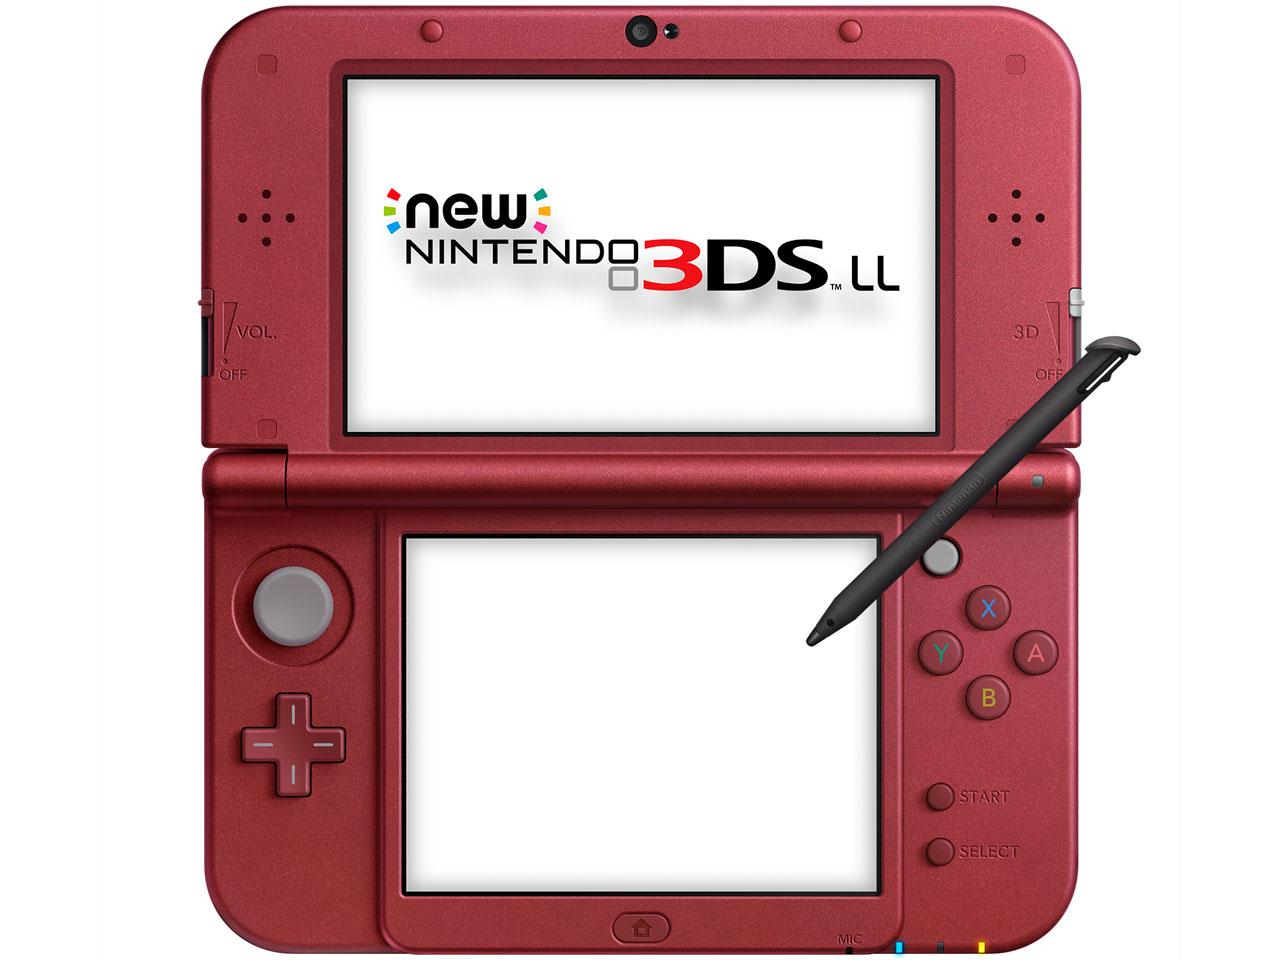 �w�{�́x New�j���e���h�[3DS LL ���^���b�N���b�h �̐��i�摜